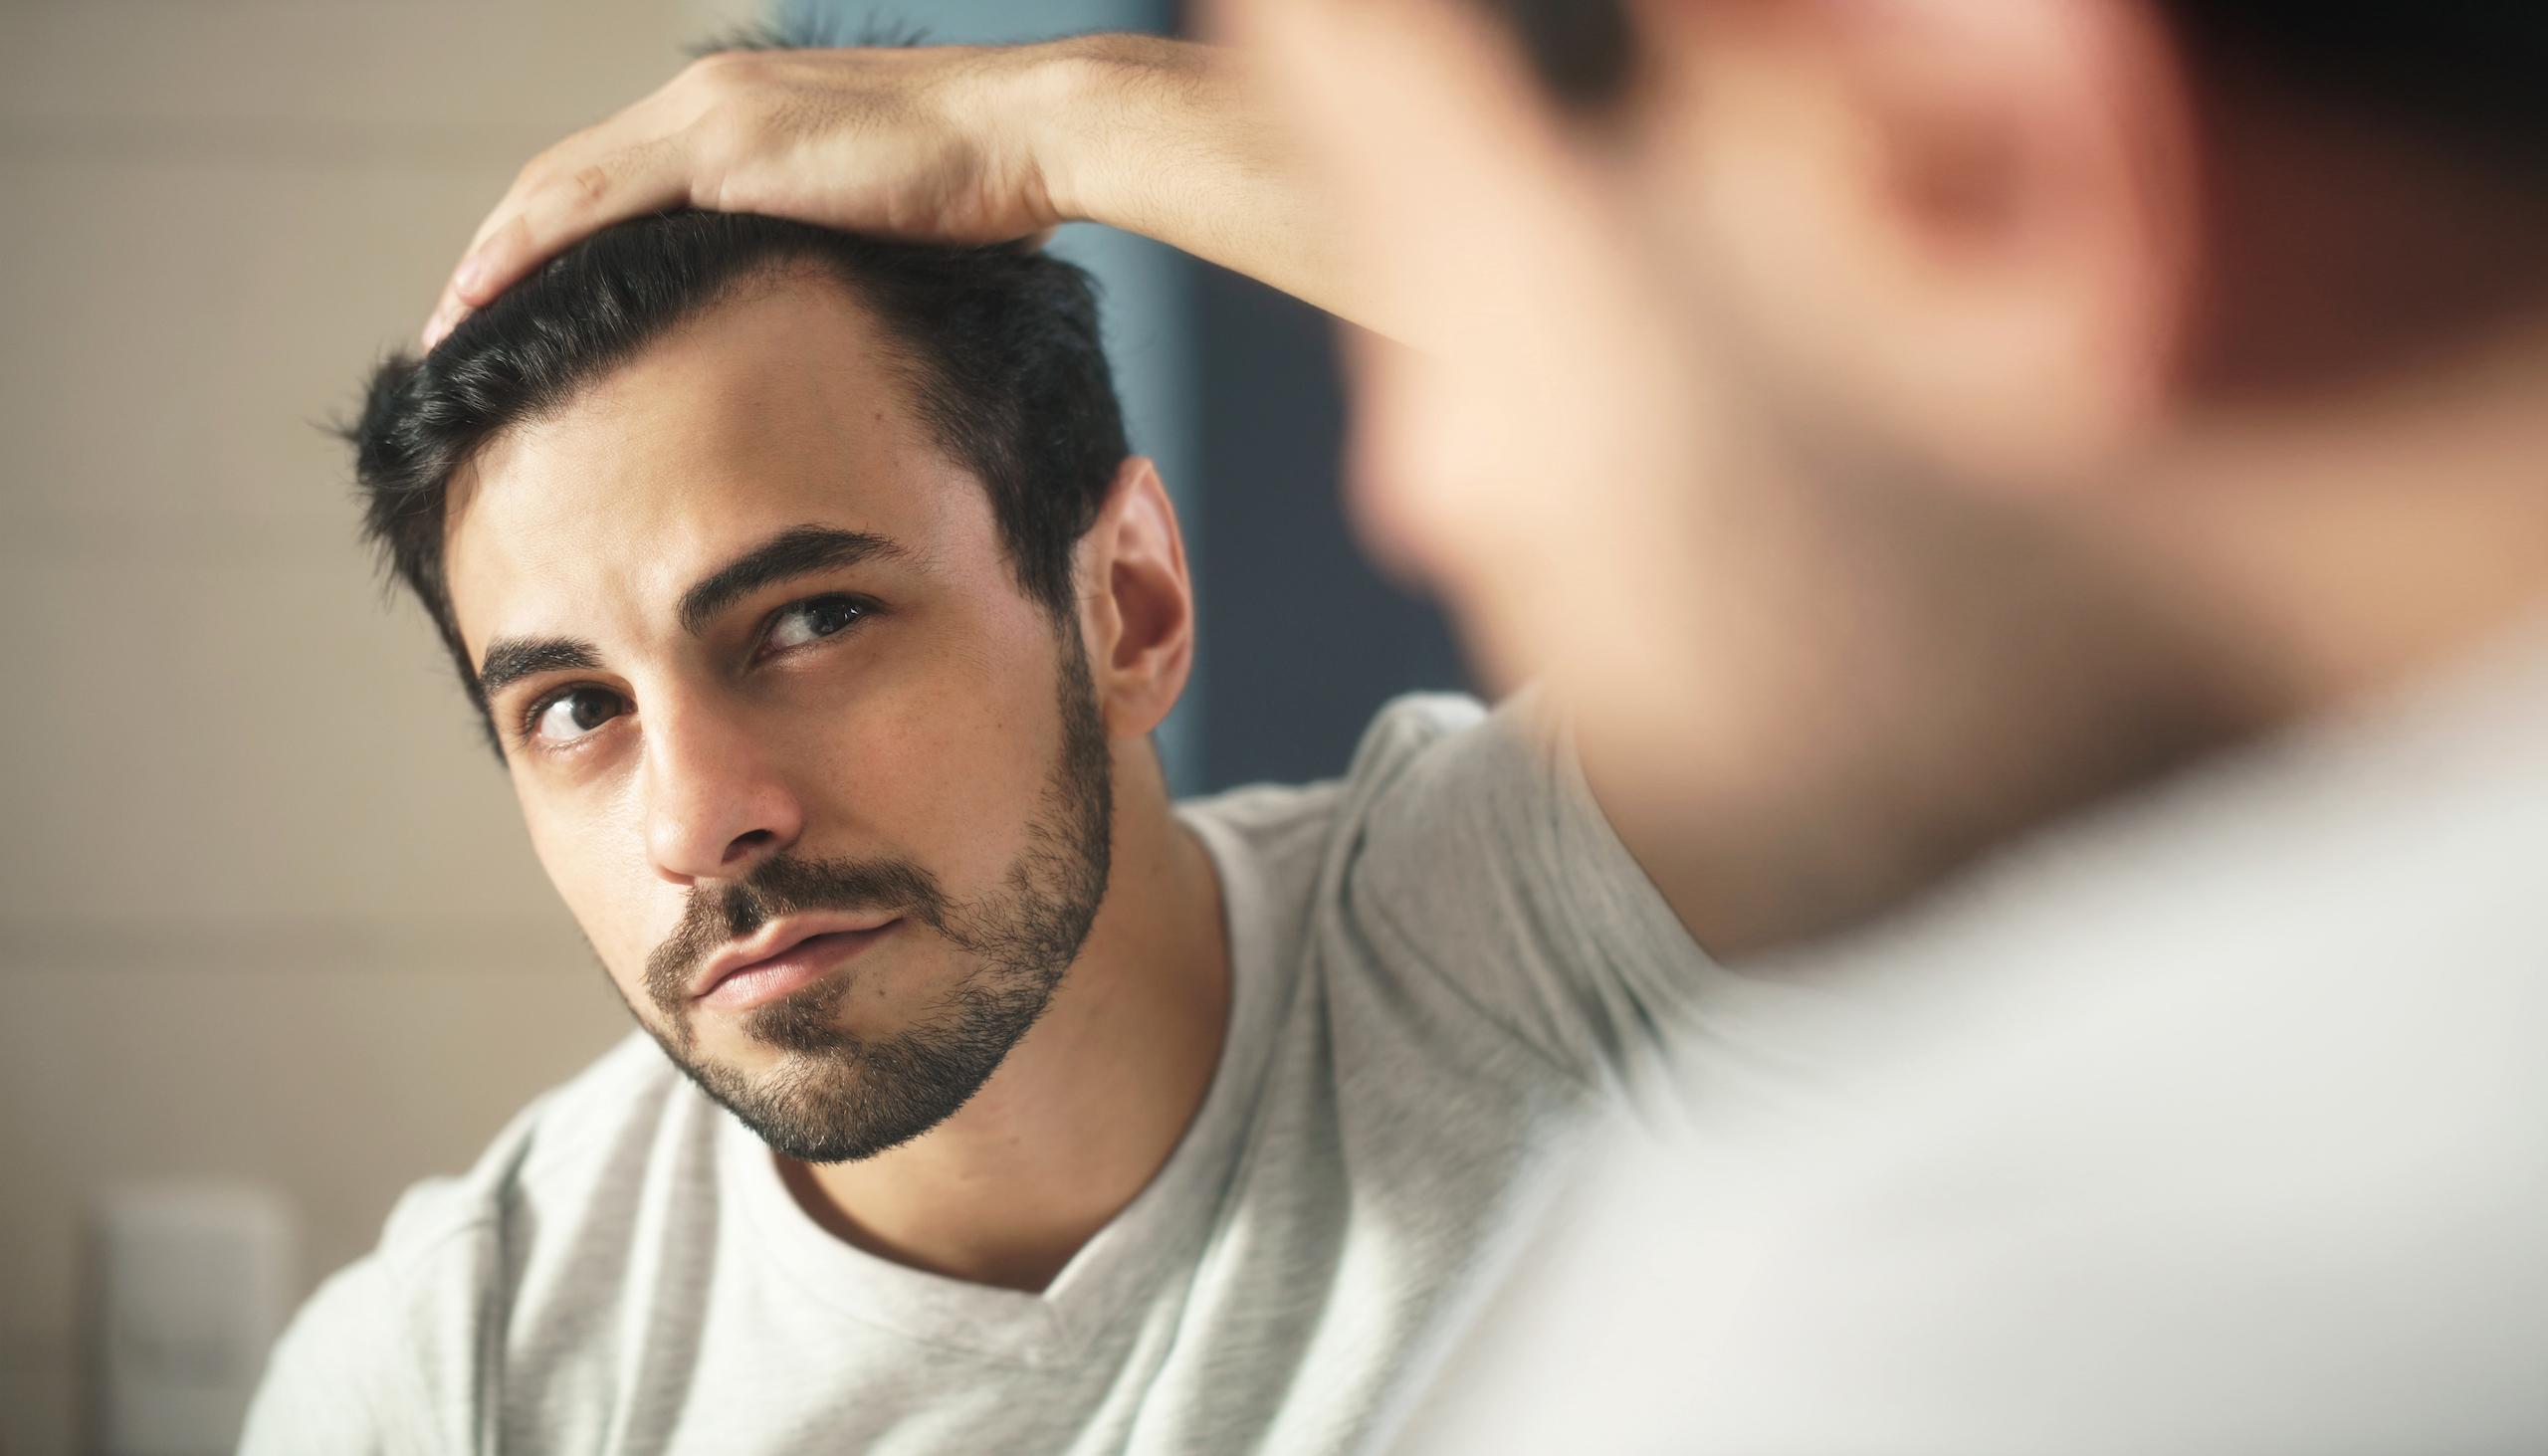 Hair Loss - Dr Lisa Chan on how to avoid hair loss and maintain a full head of hair